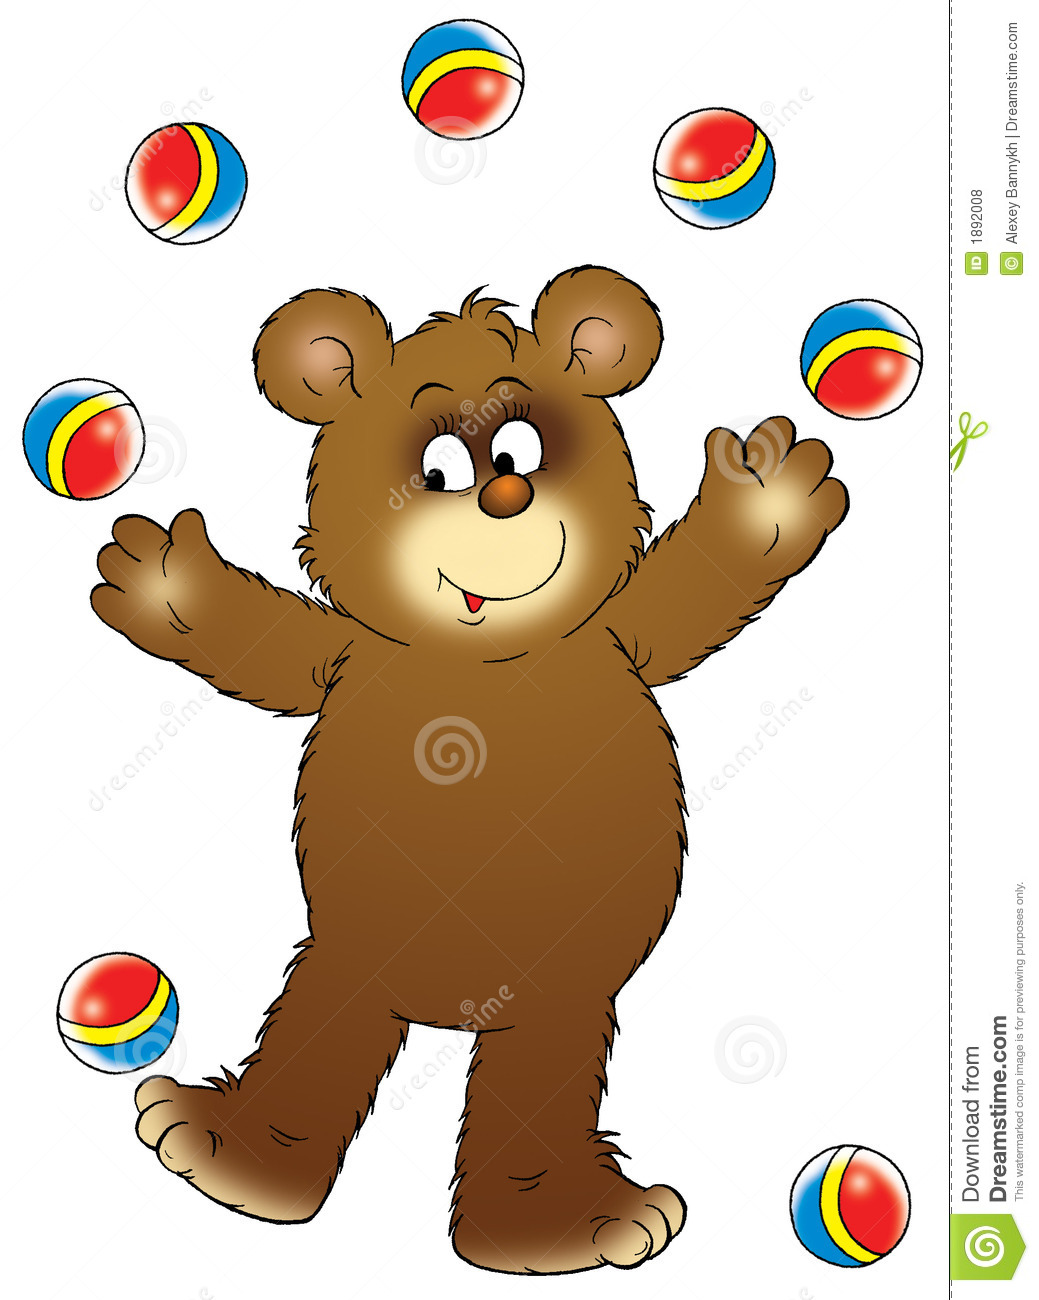 Circus Bear stock illustration. Illustration of graphic.